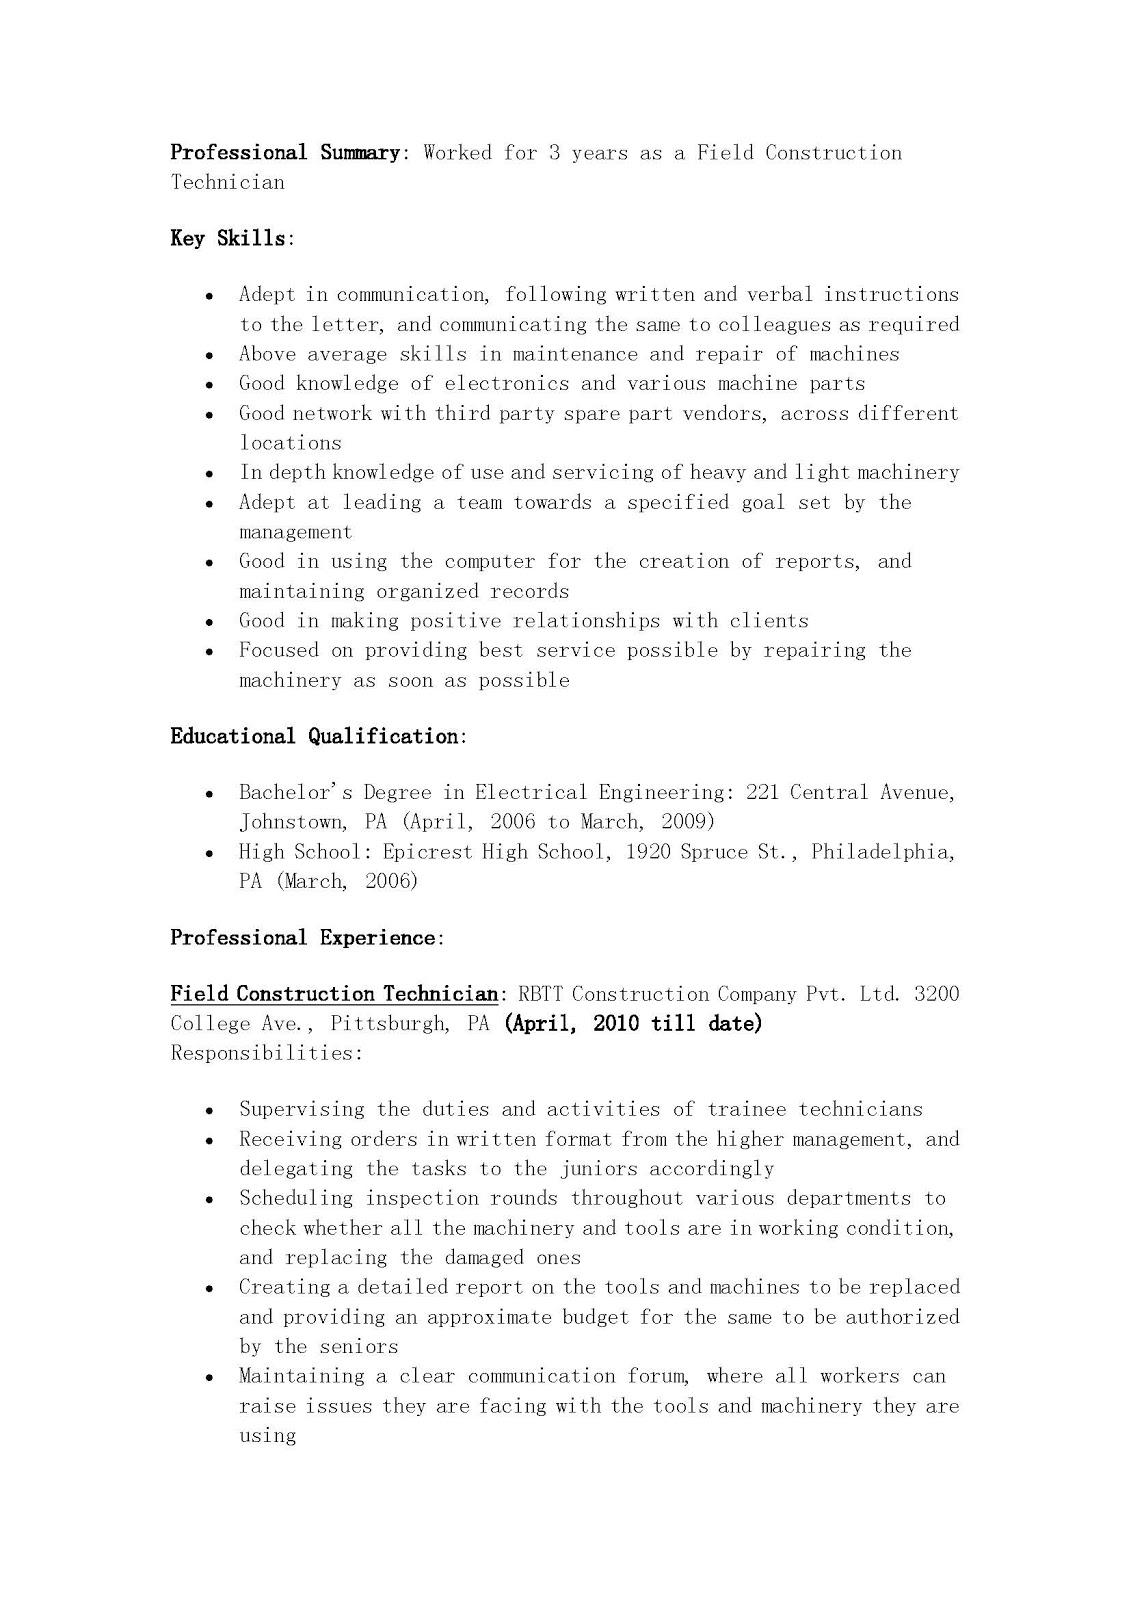 Resume 8 Construction Resume Templates Doc Free 5000 Free